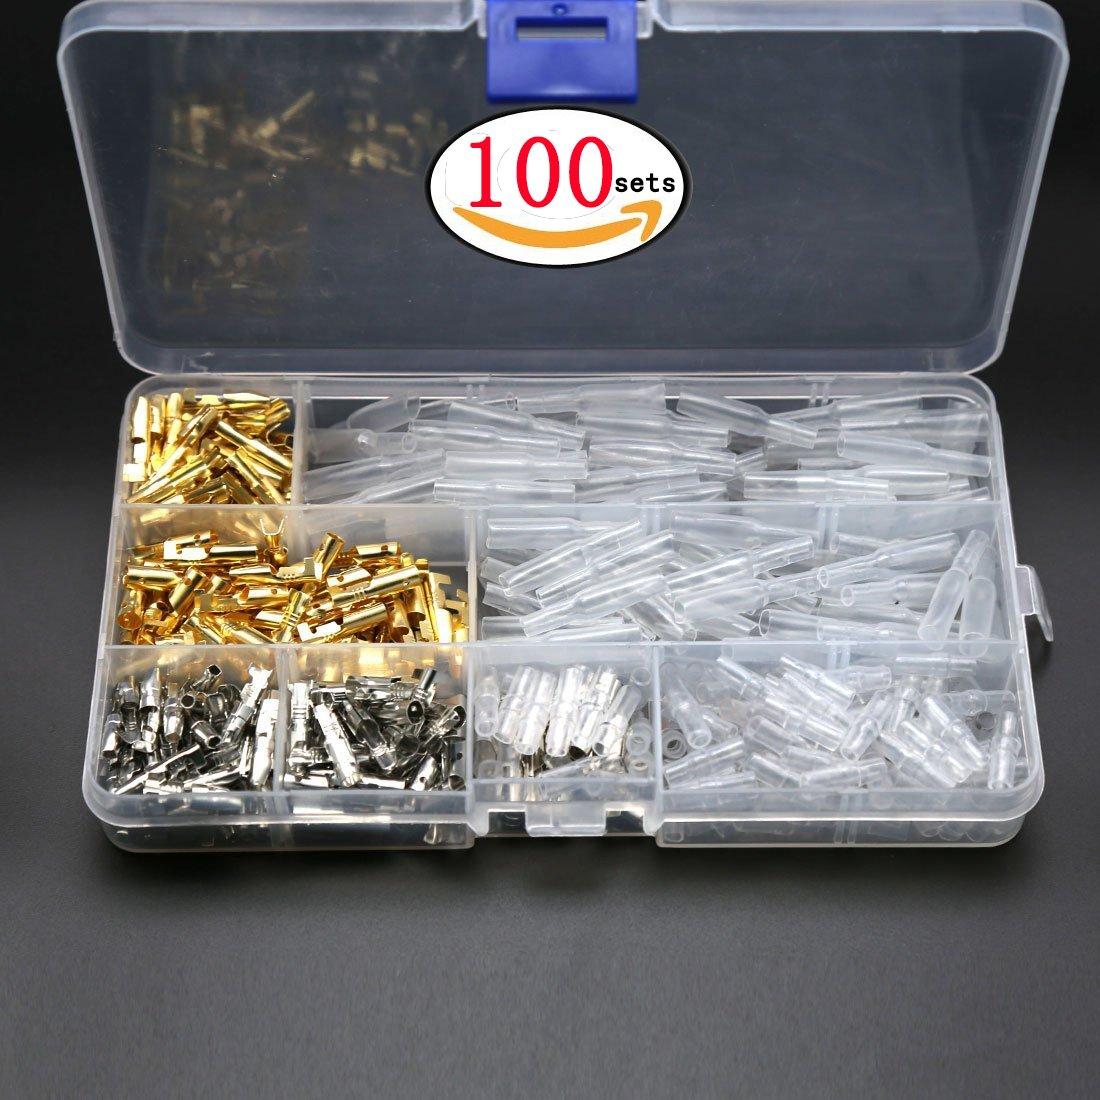 100sets 3.9 MMワイヤコネクタ断熱材でカバー真鍮Bulletオス&メスターミナルbox-packed B07C6FL8CZ